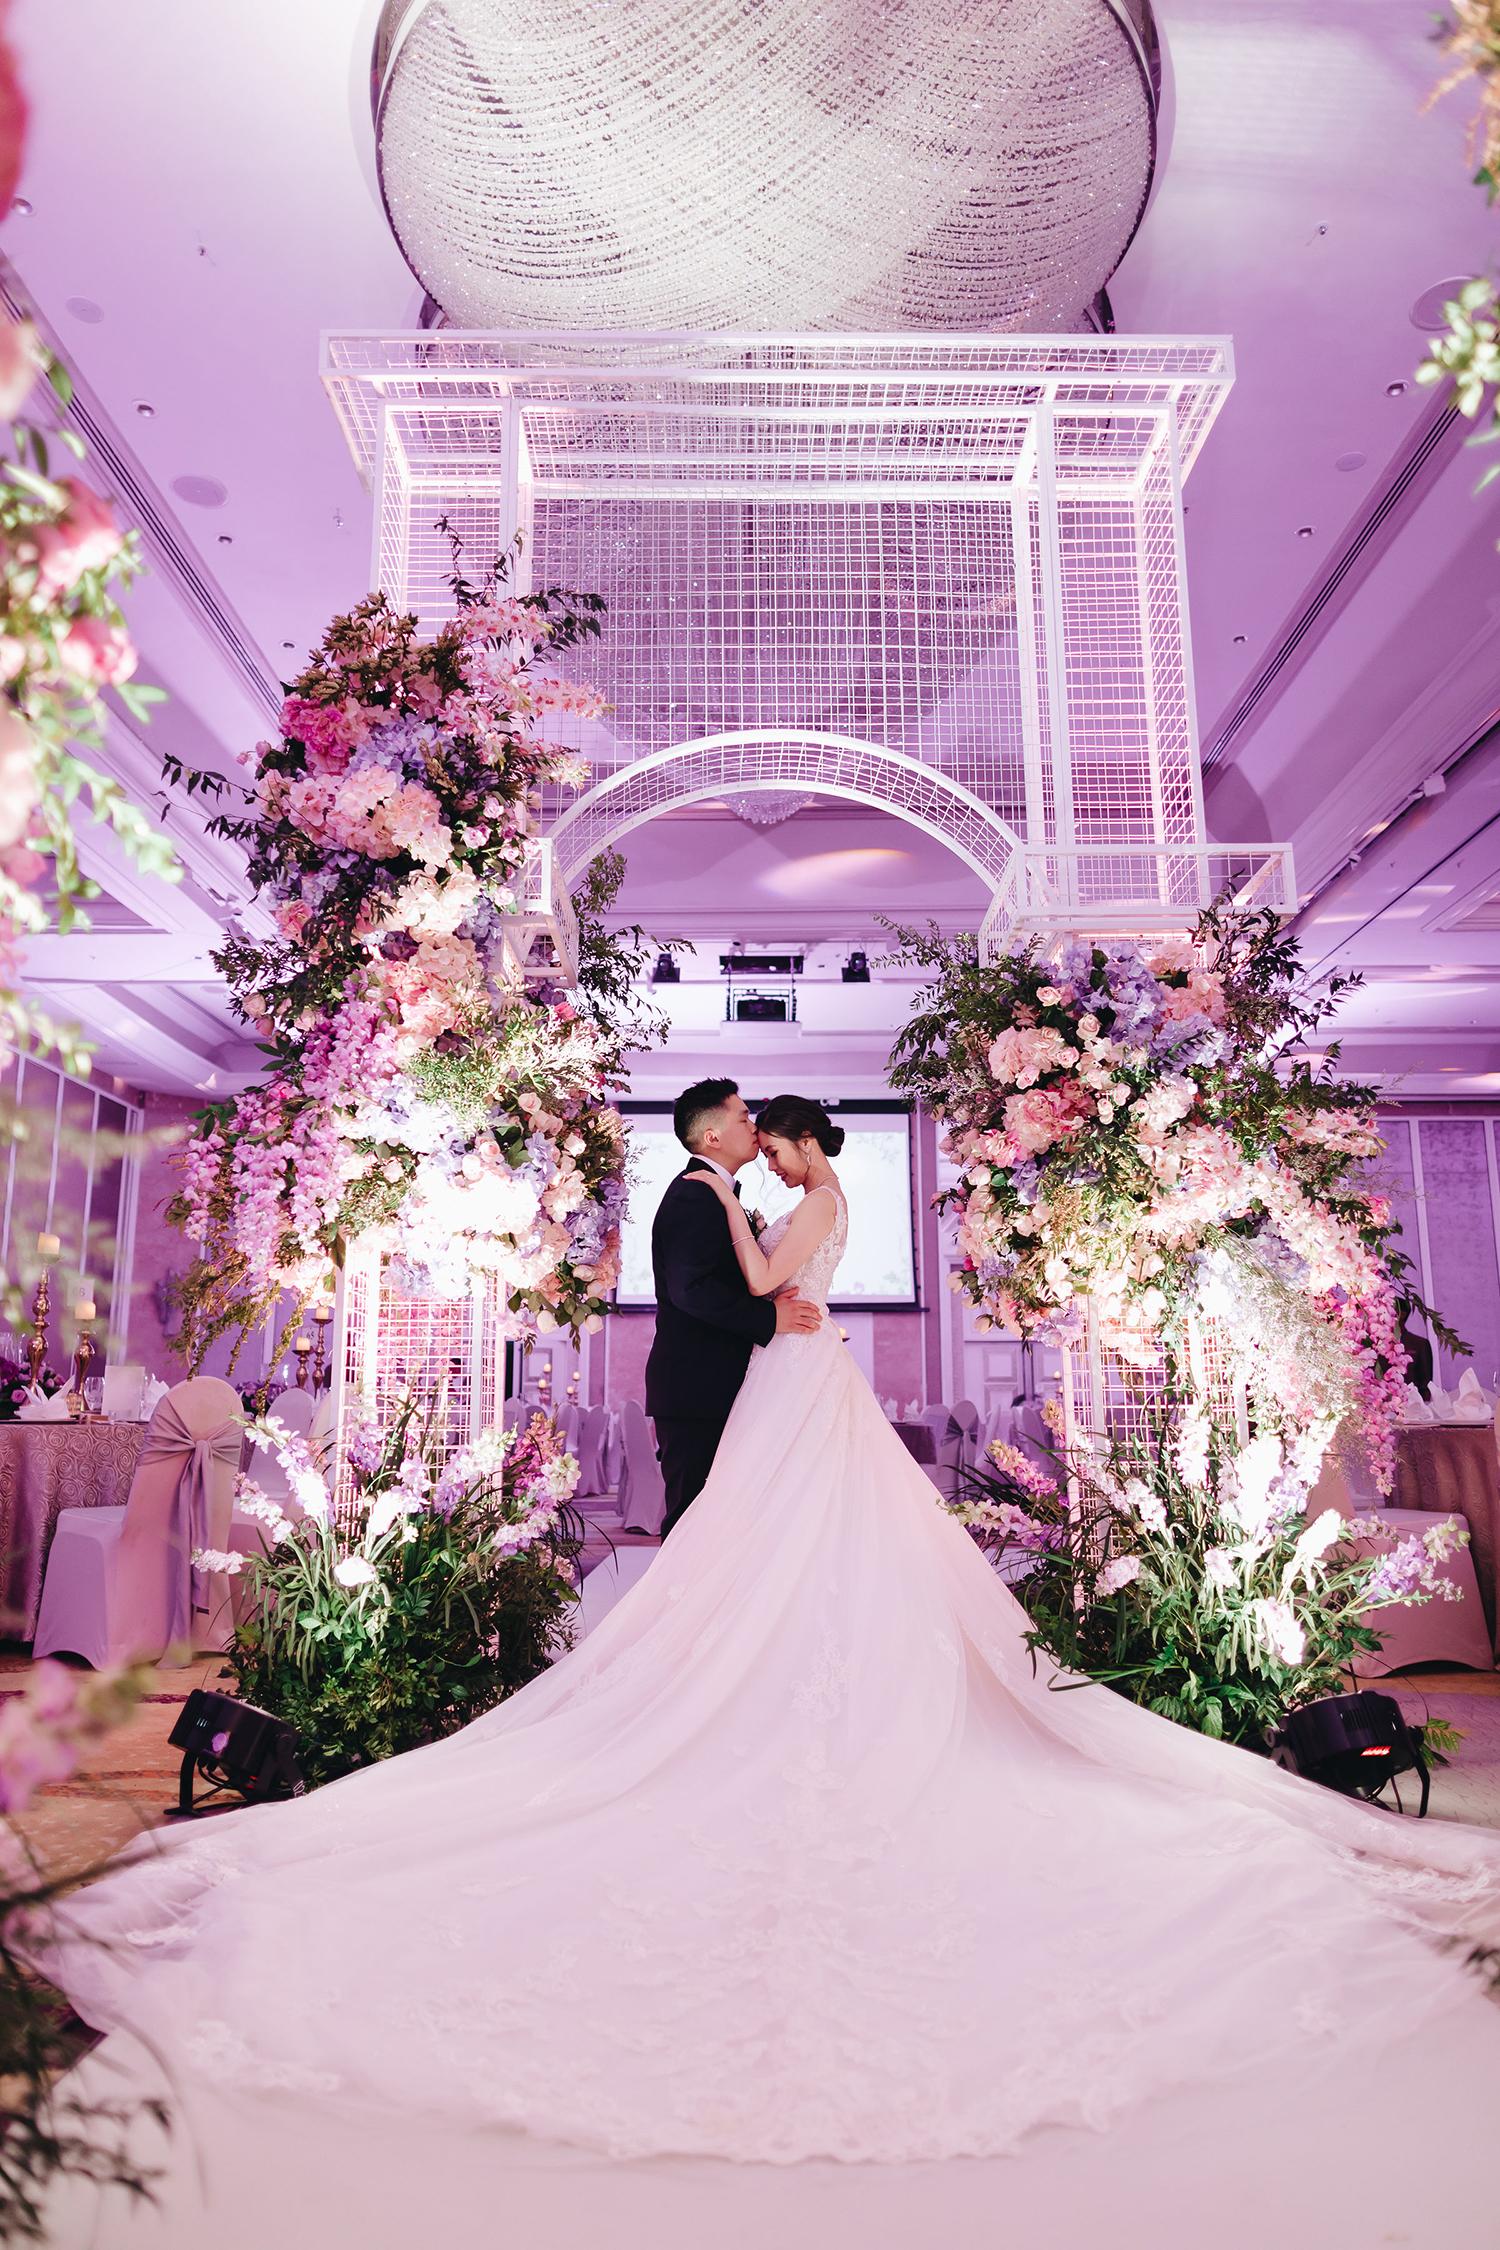 Gen han + Isabelle - Grand Wedding @ Shanri-la Kl